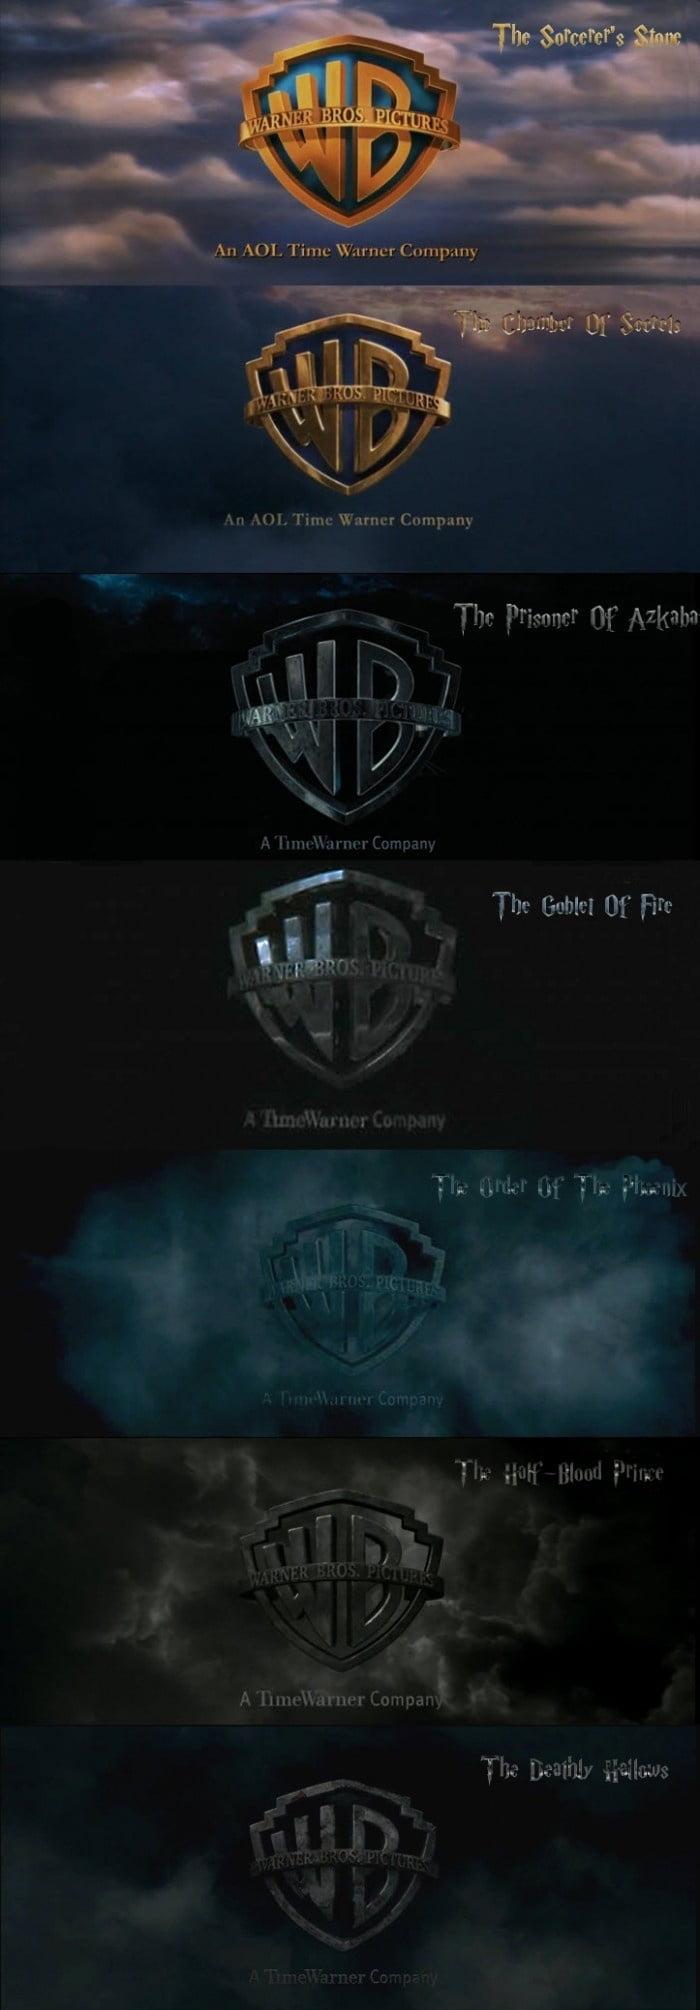 The best Warner Bros. logo evolution in a film series.